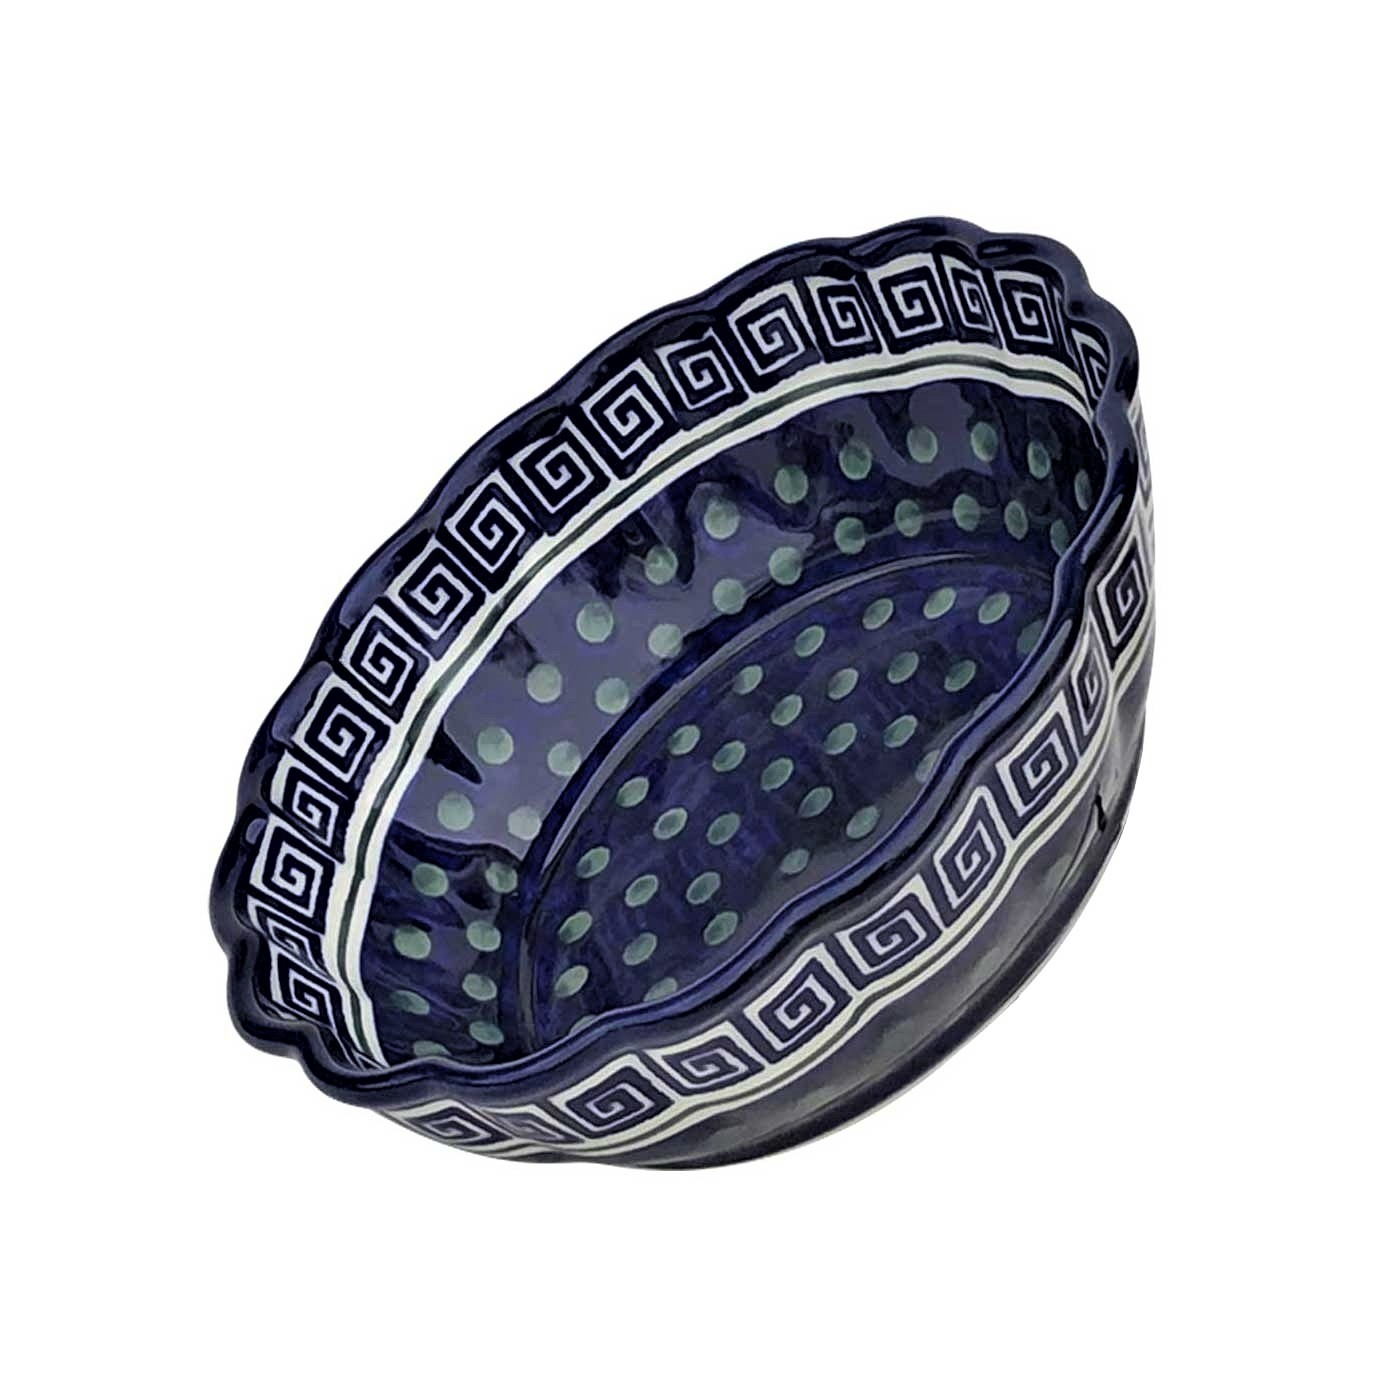 Pottery Avenue Scalloped Stoneware Baking-Serving Bowl - 1278-269A Atlantis